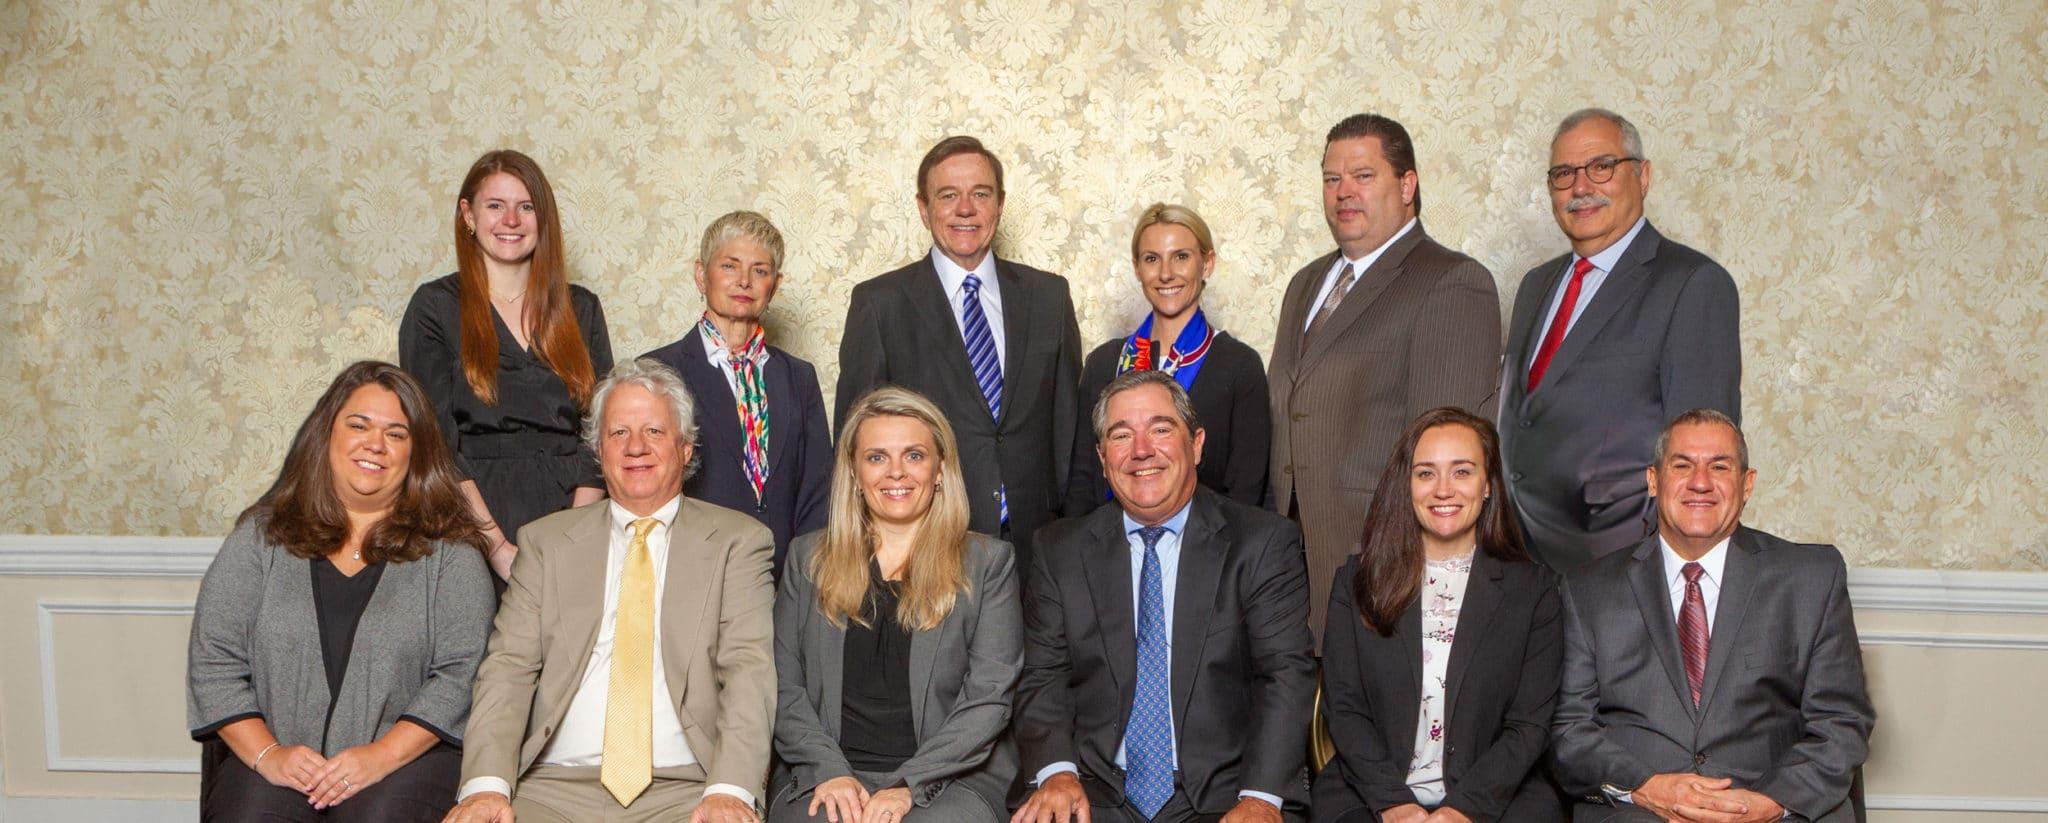 COI Board of Directors, May 2019